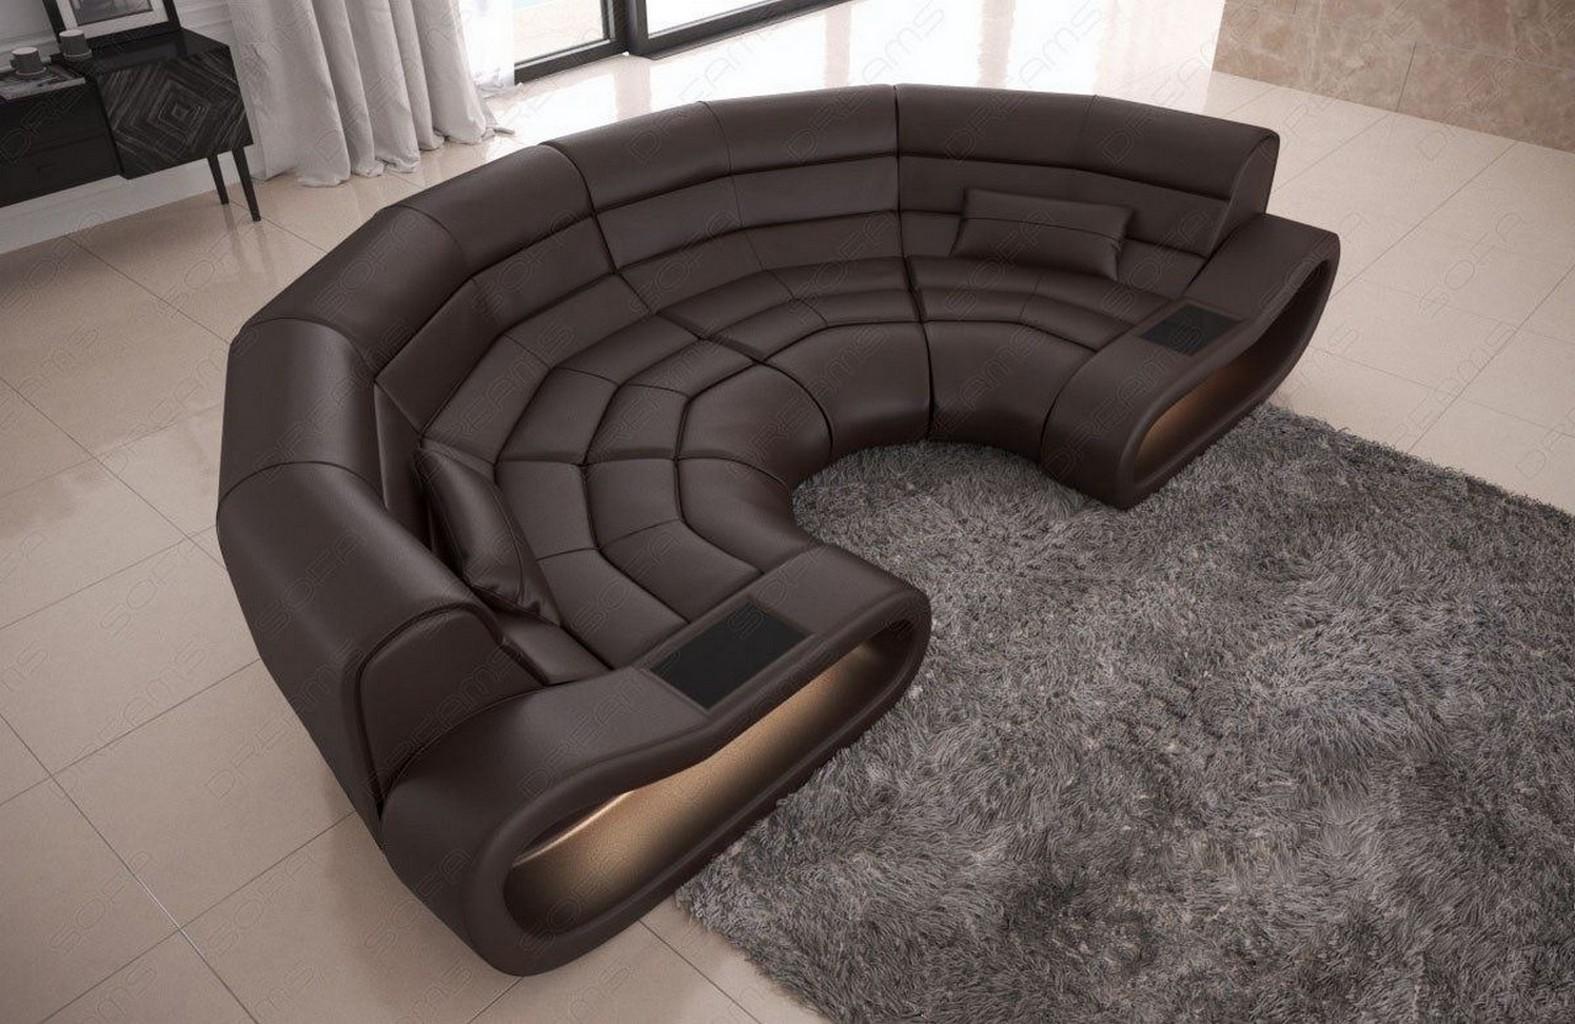 leder couch bigsofa ecksofa megacouch gem tlich dunkelbraun concept beleuchtung ebay. Black Bedroom Furniture Sets. Home Design Ideas